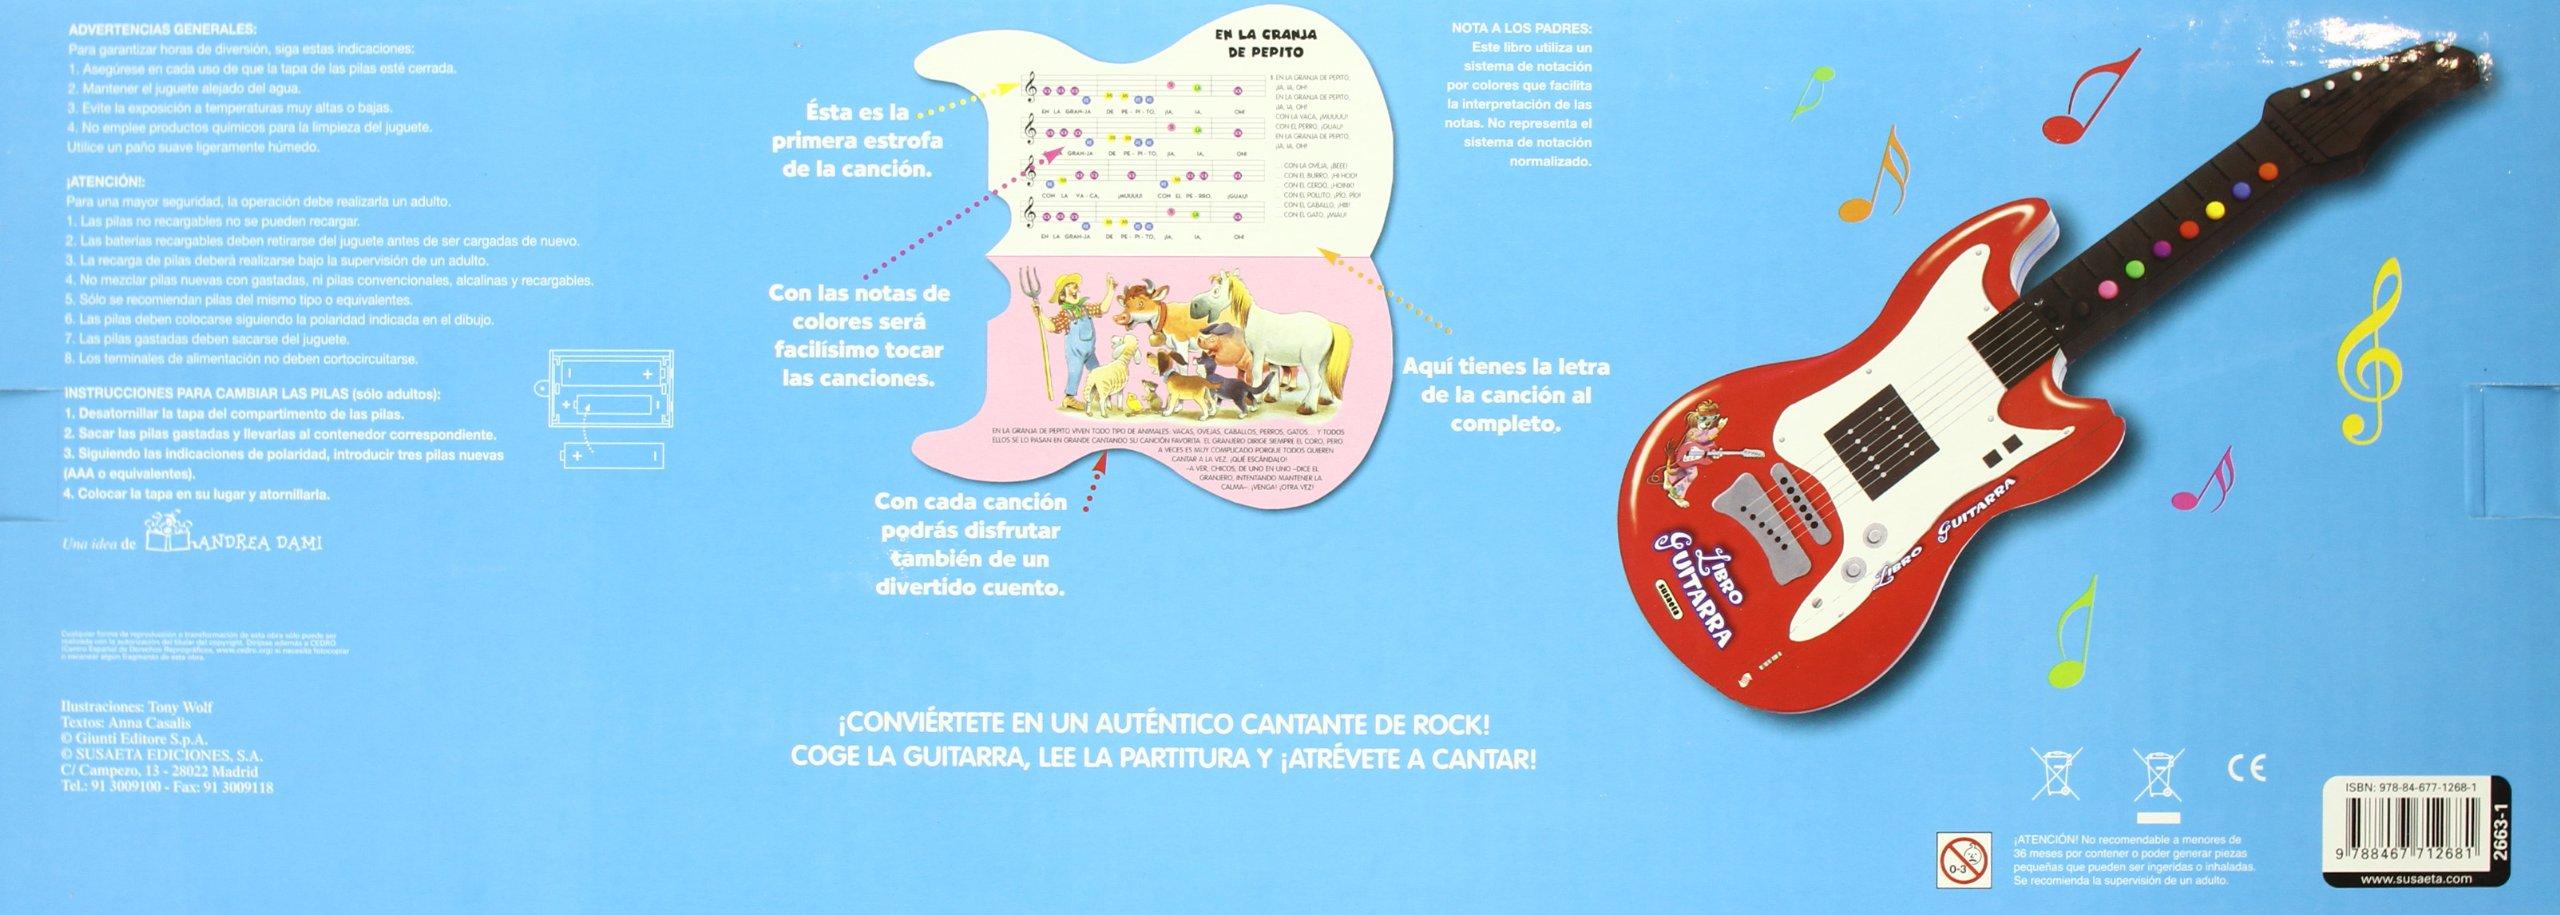 Amazon.com: Libro guitarra / Guitar book (Spanish Edition) (9788467712681): Books